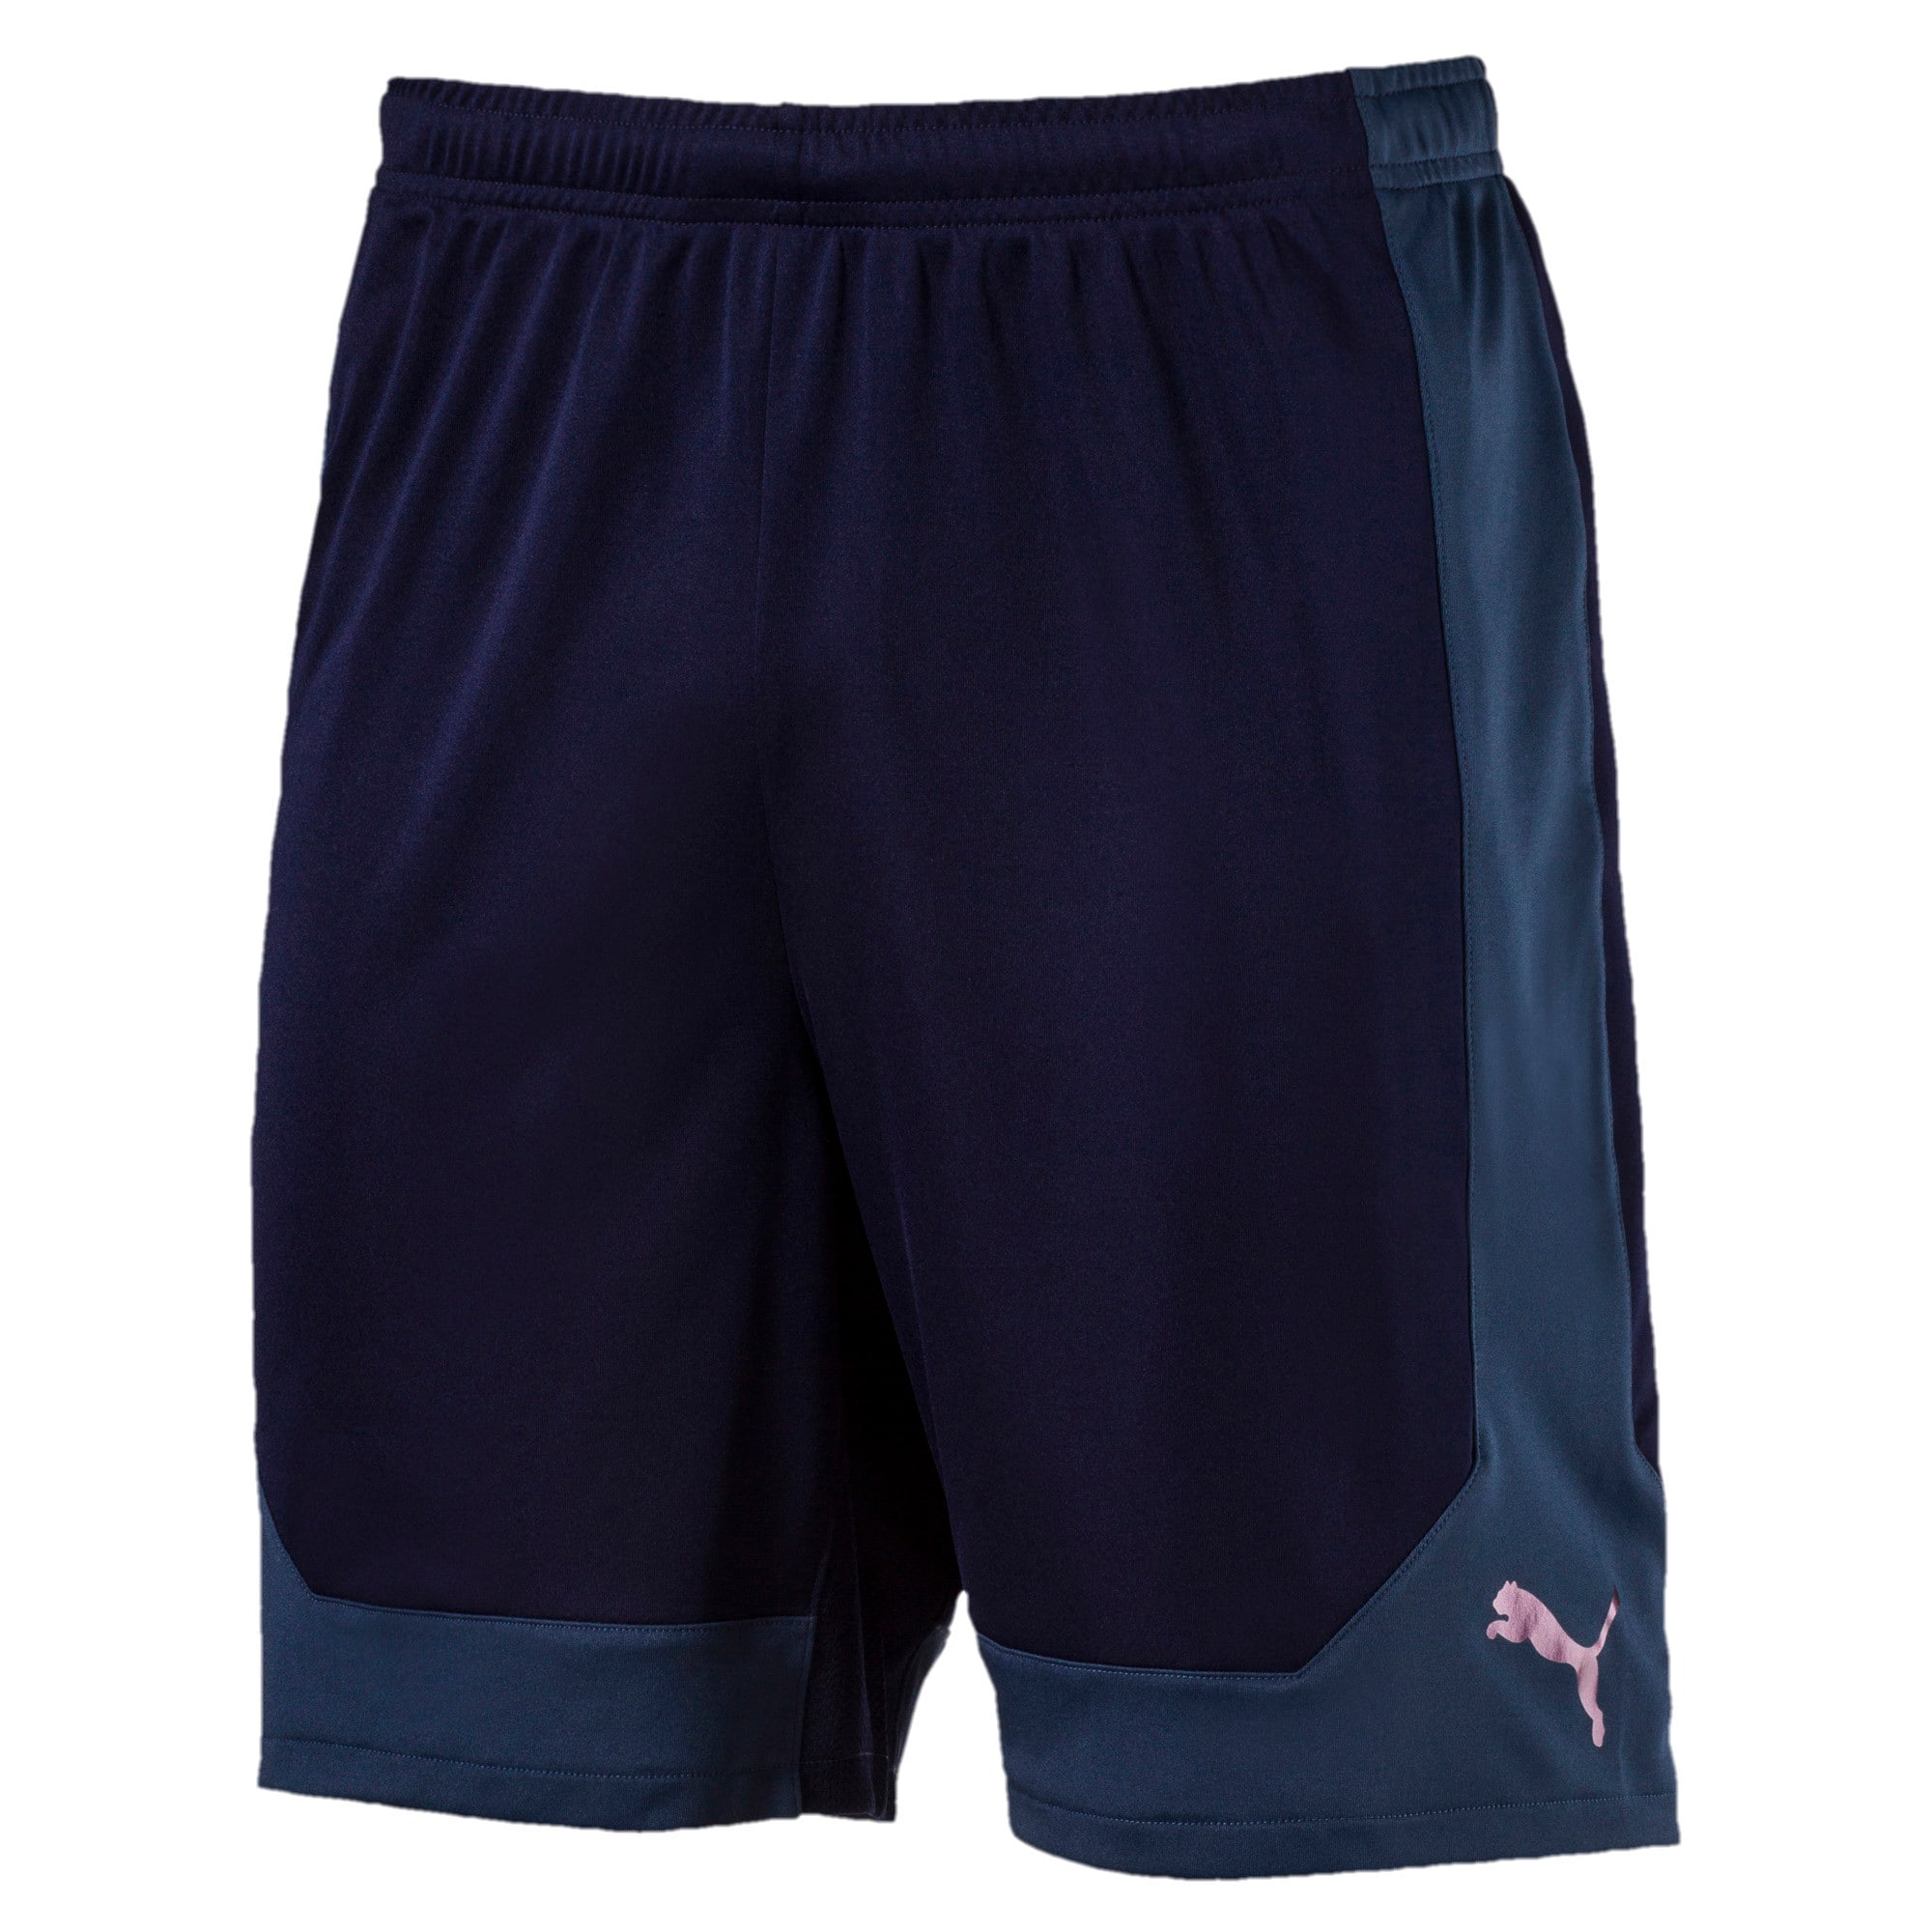 Thumbnail 1 of ftblNXT Men's Training Shorts, Peacoat-Dark Denim, medium